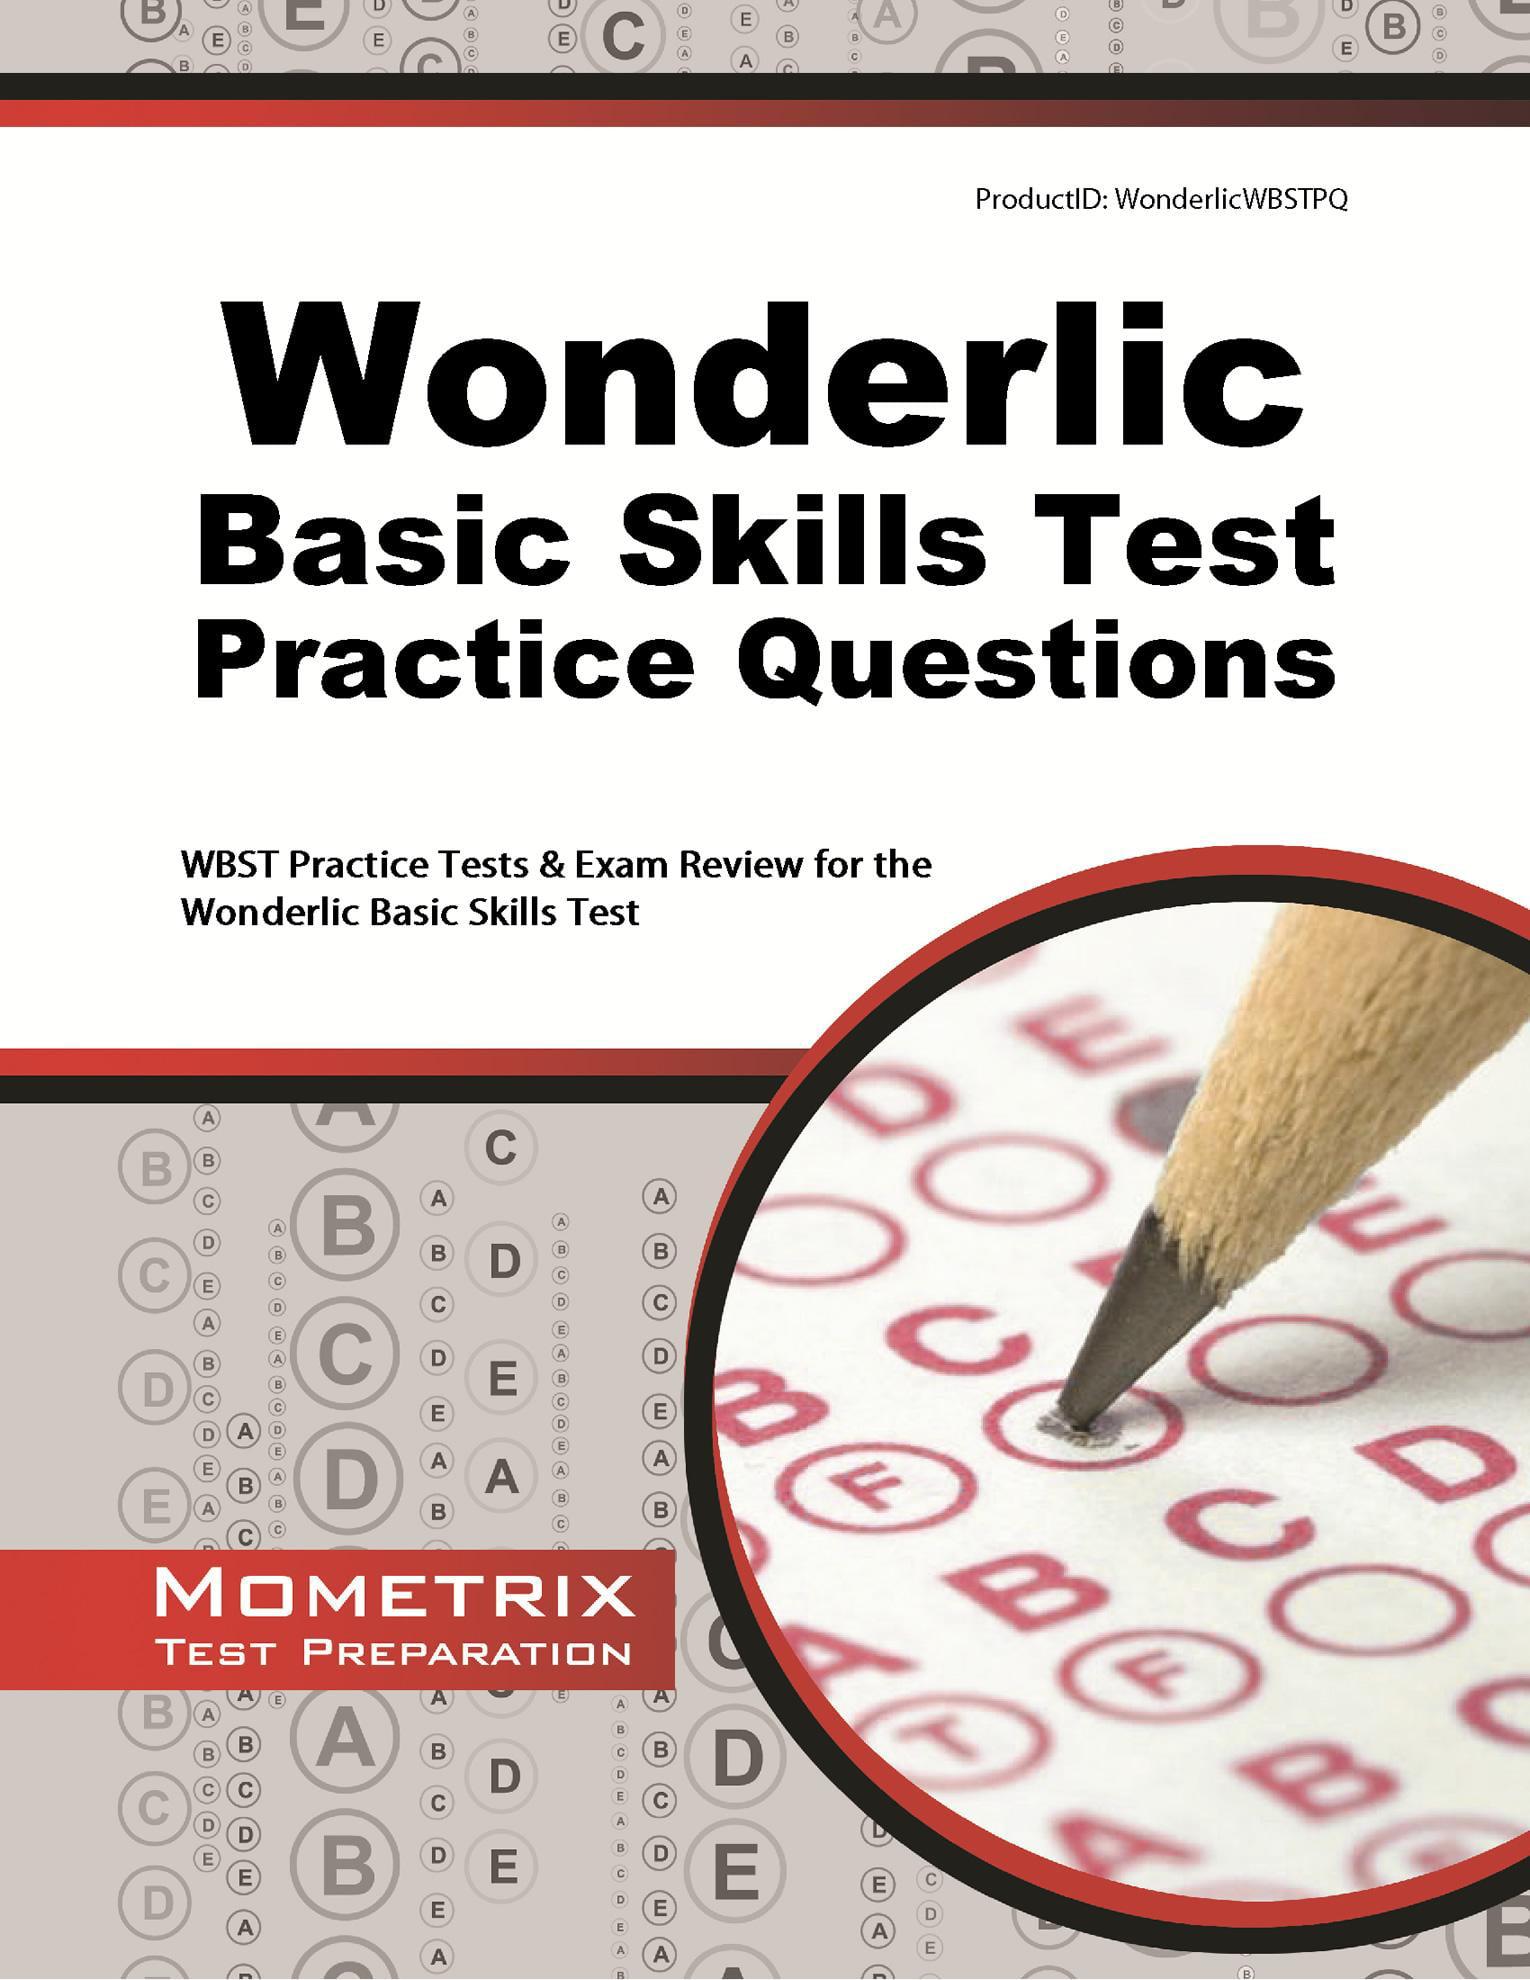 Wonderlic Basic Skills Test Practice Questions - Walmart.com